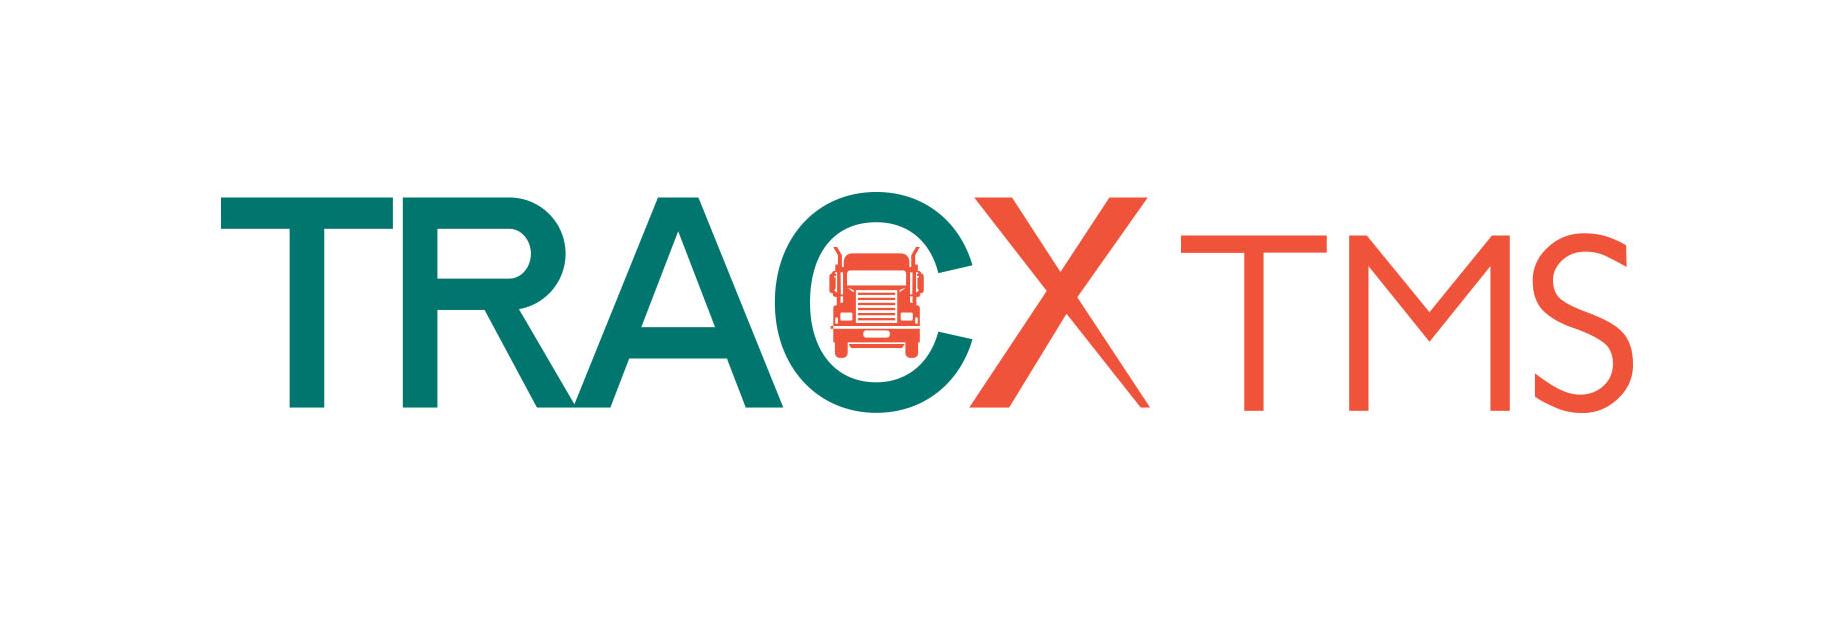 TracxTMS logo